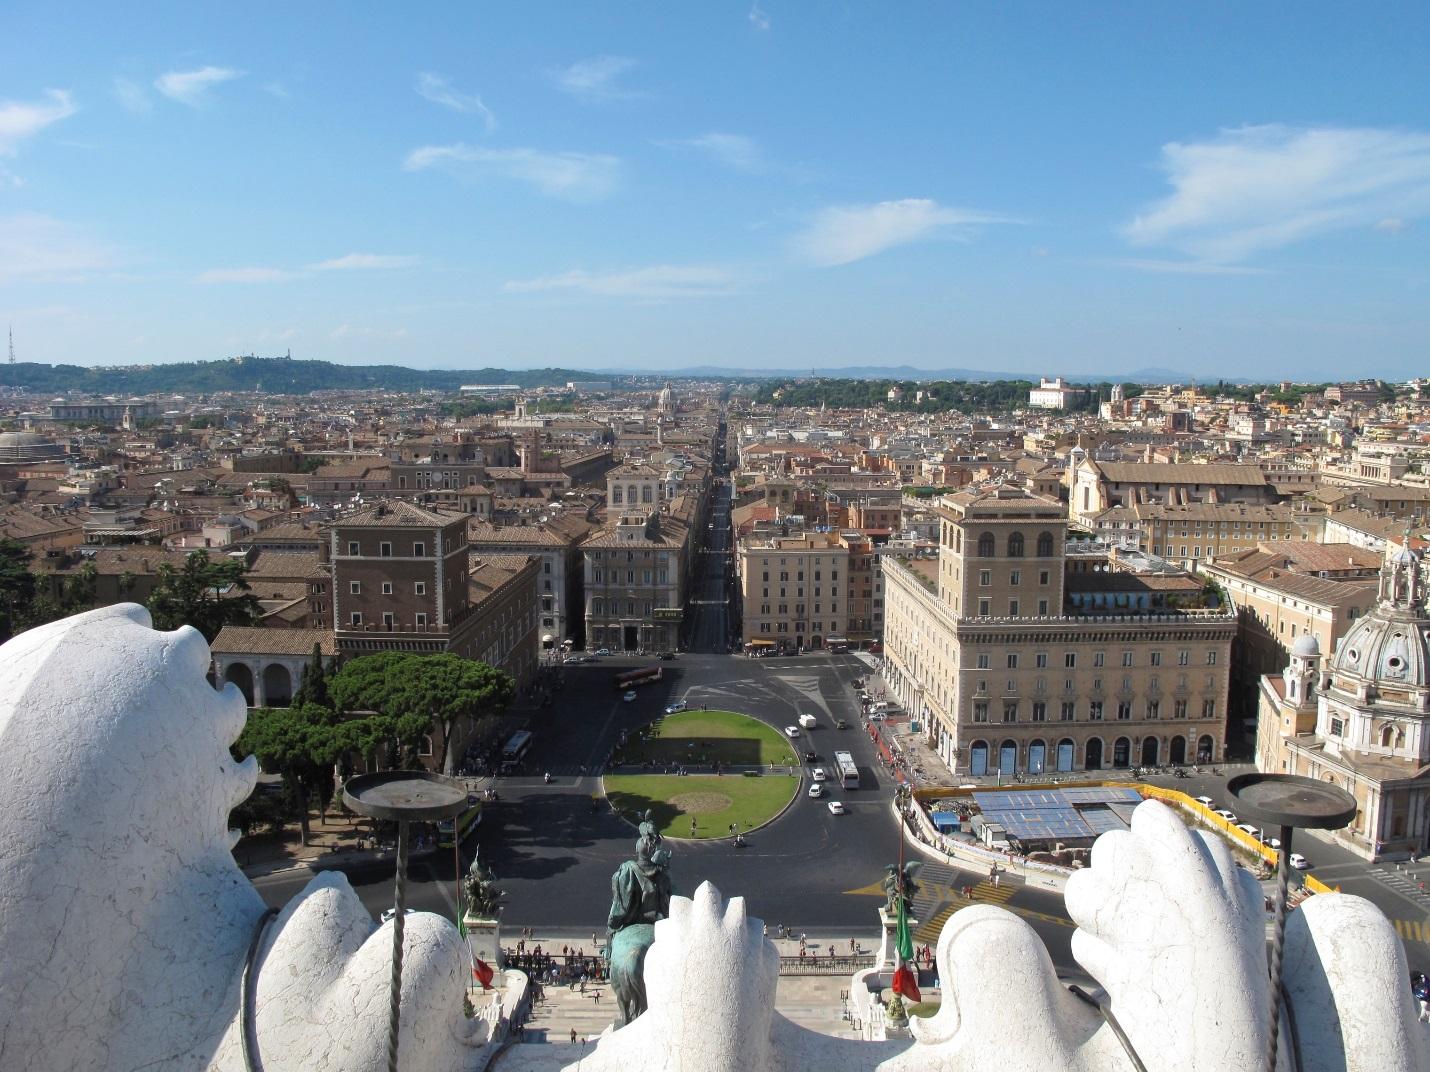 JCU students also enjoy the breathtaking view of Rome from atop the Altare della Patria